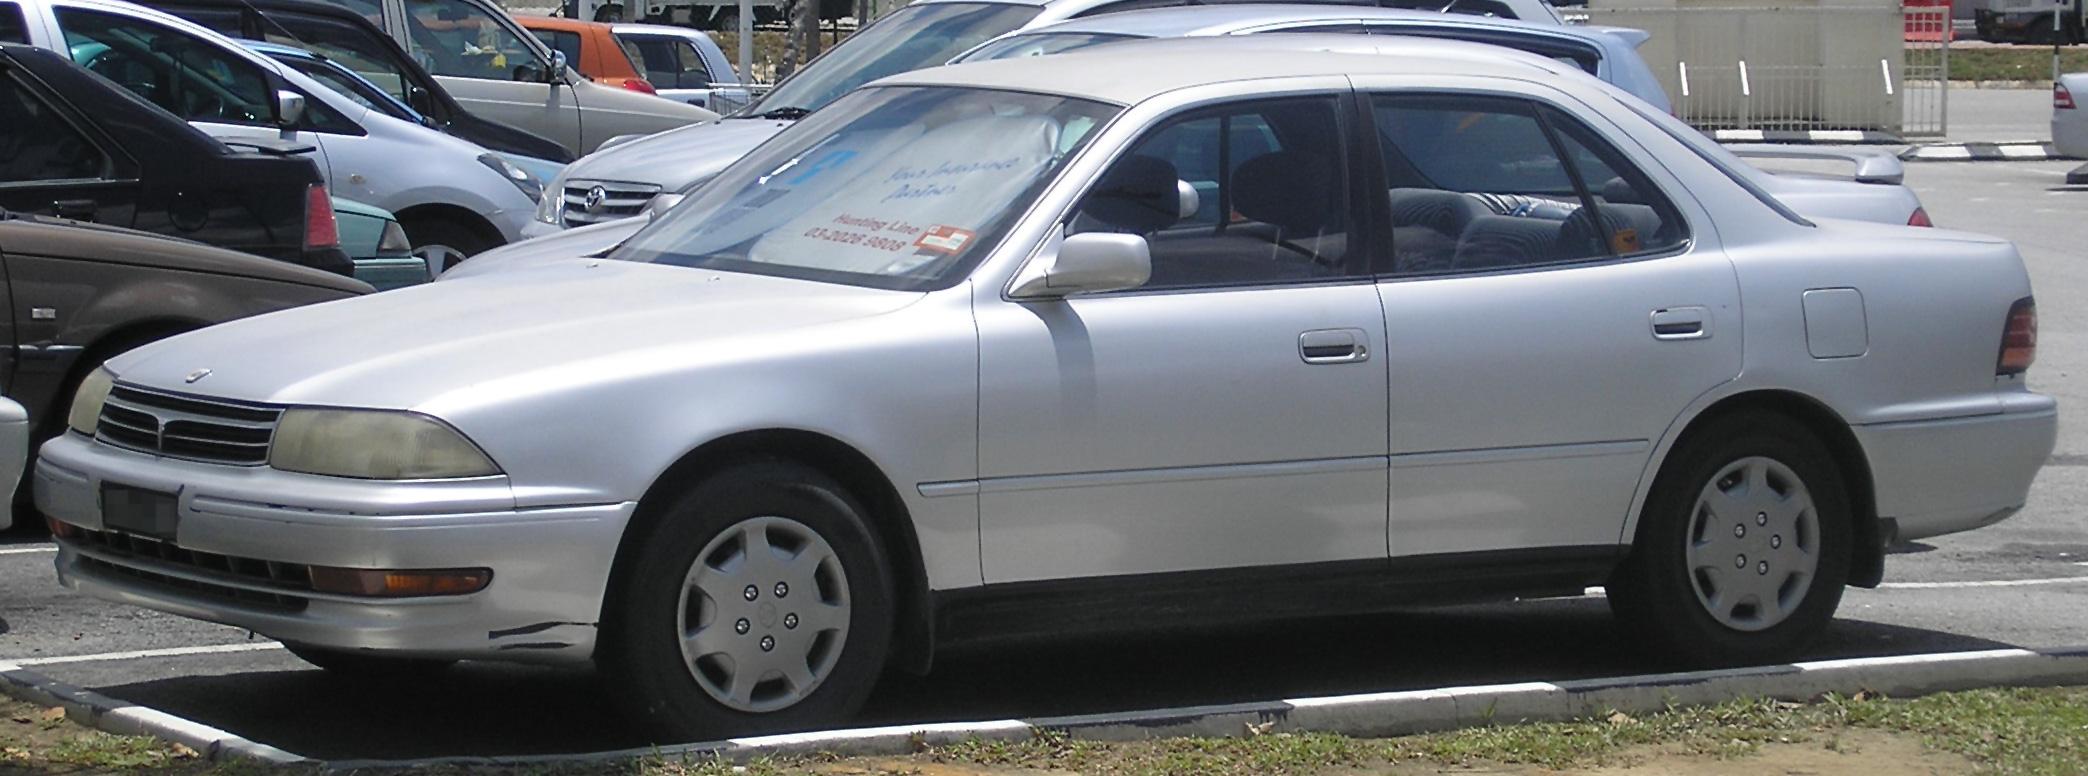 Toyota Vista III (V30) 1990 - 1994 Sedan-Hardtop #5